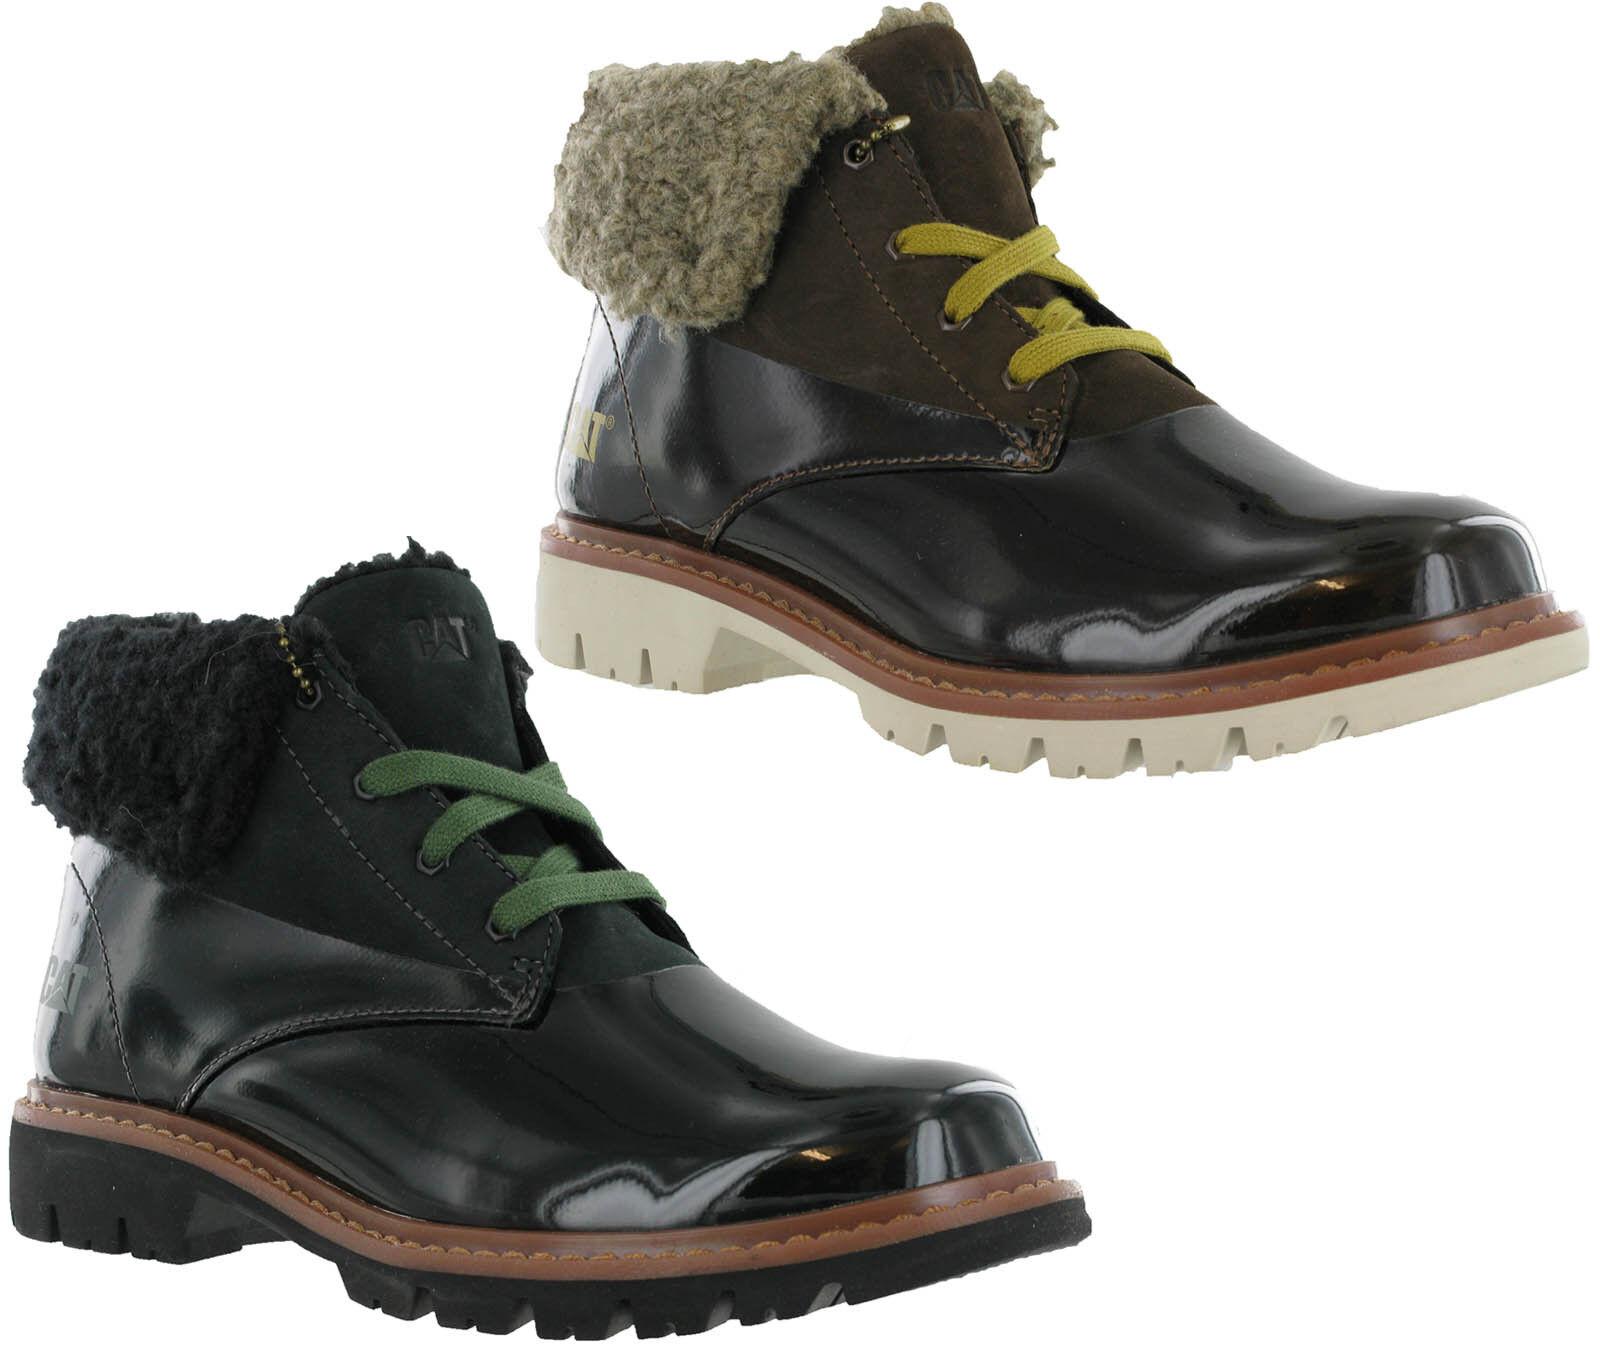 Caterpillar CAT Hub Fur Leder Lace Up Damenschuhe Ankle Stiefel Schuhes UK4-8